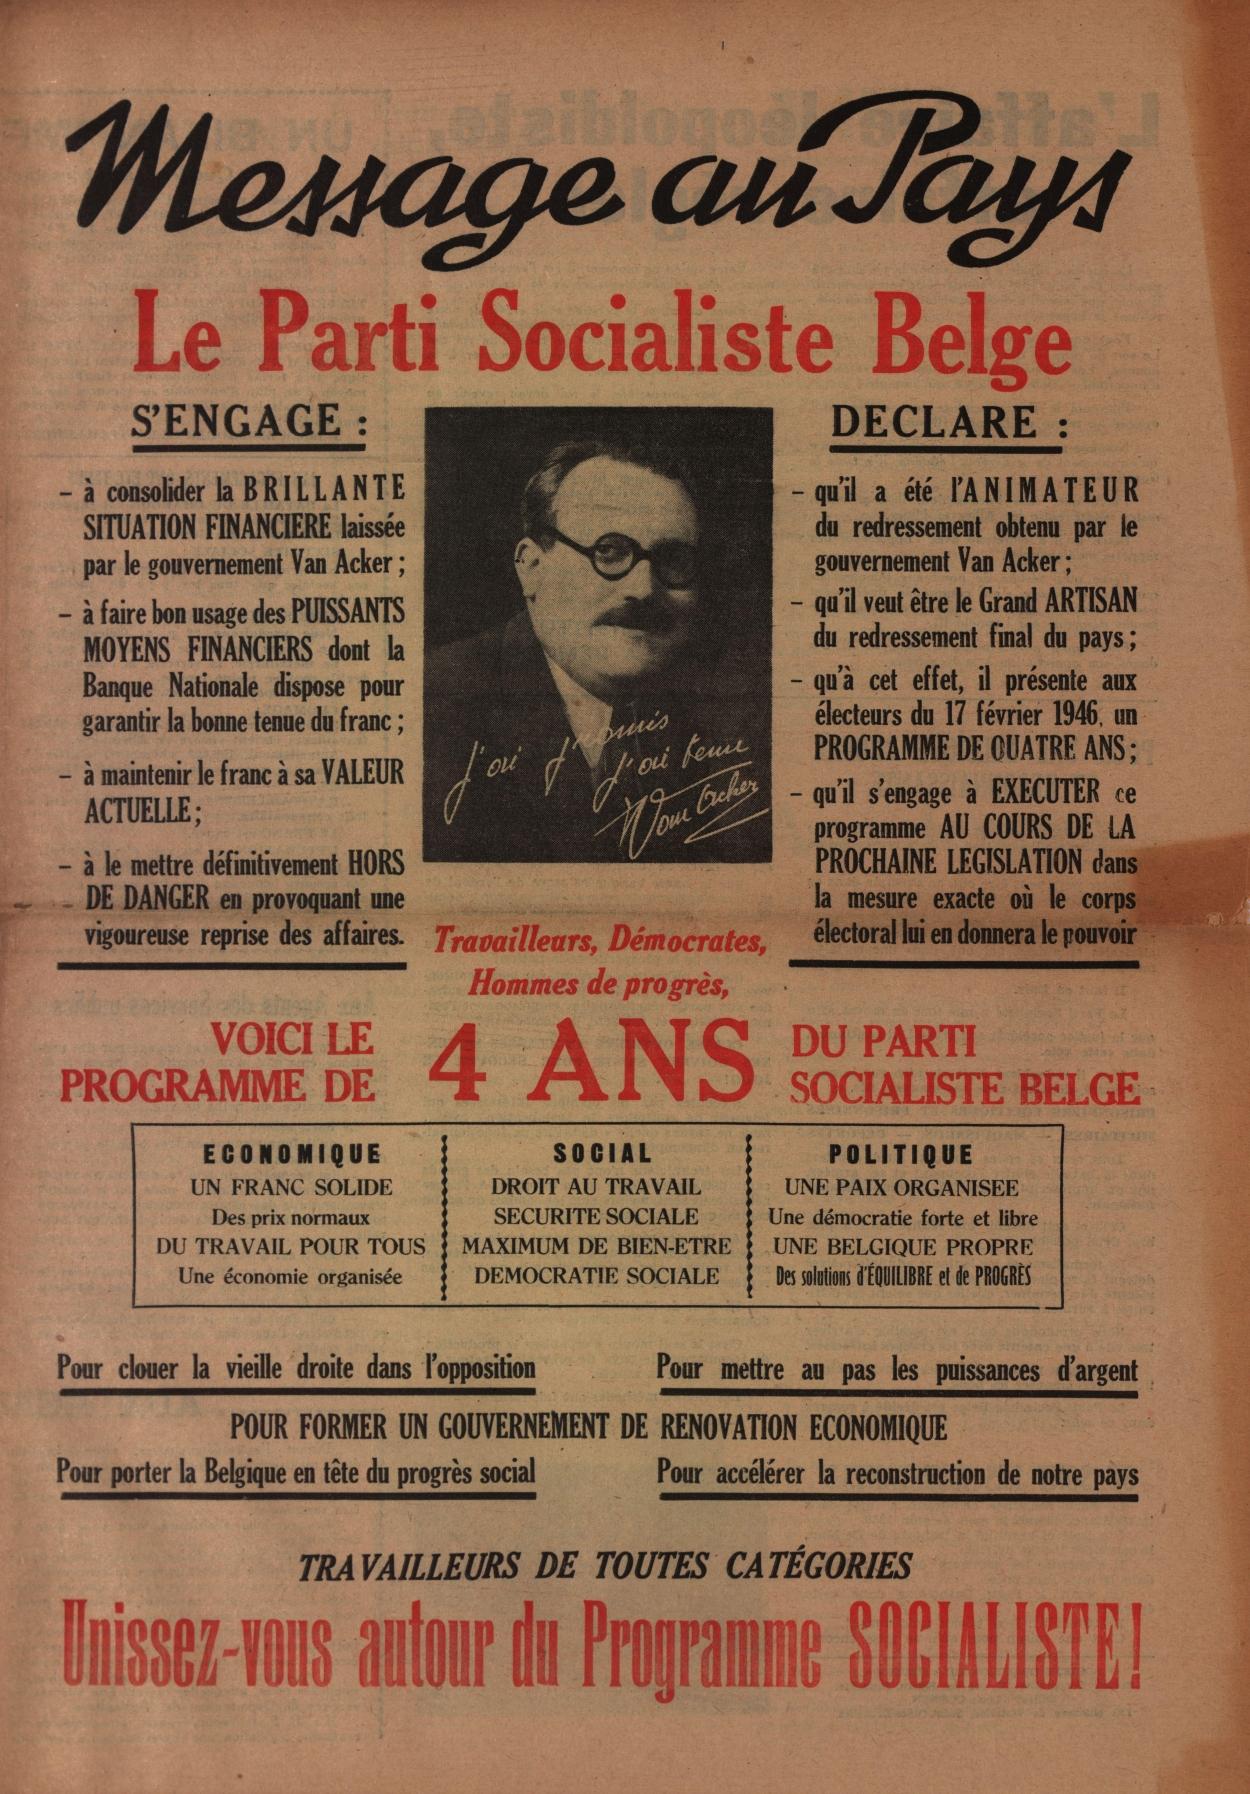 529744-2lections-1946-psb.jpg